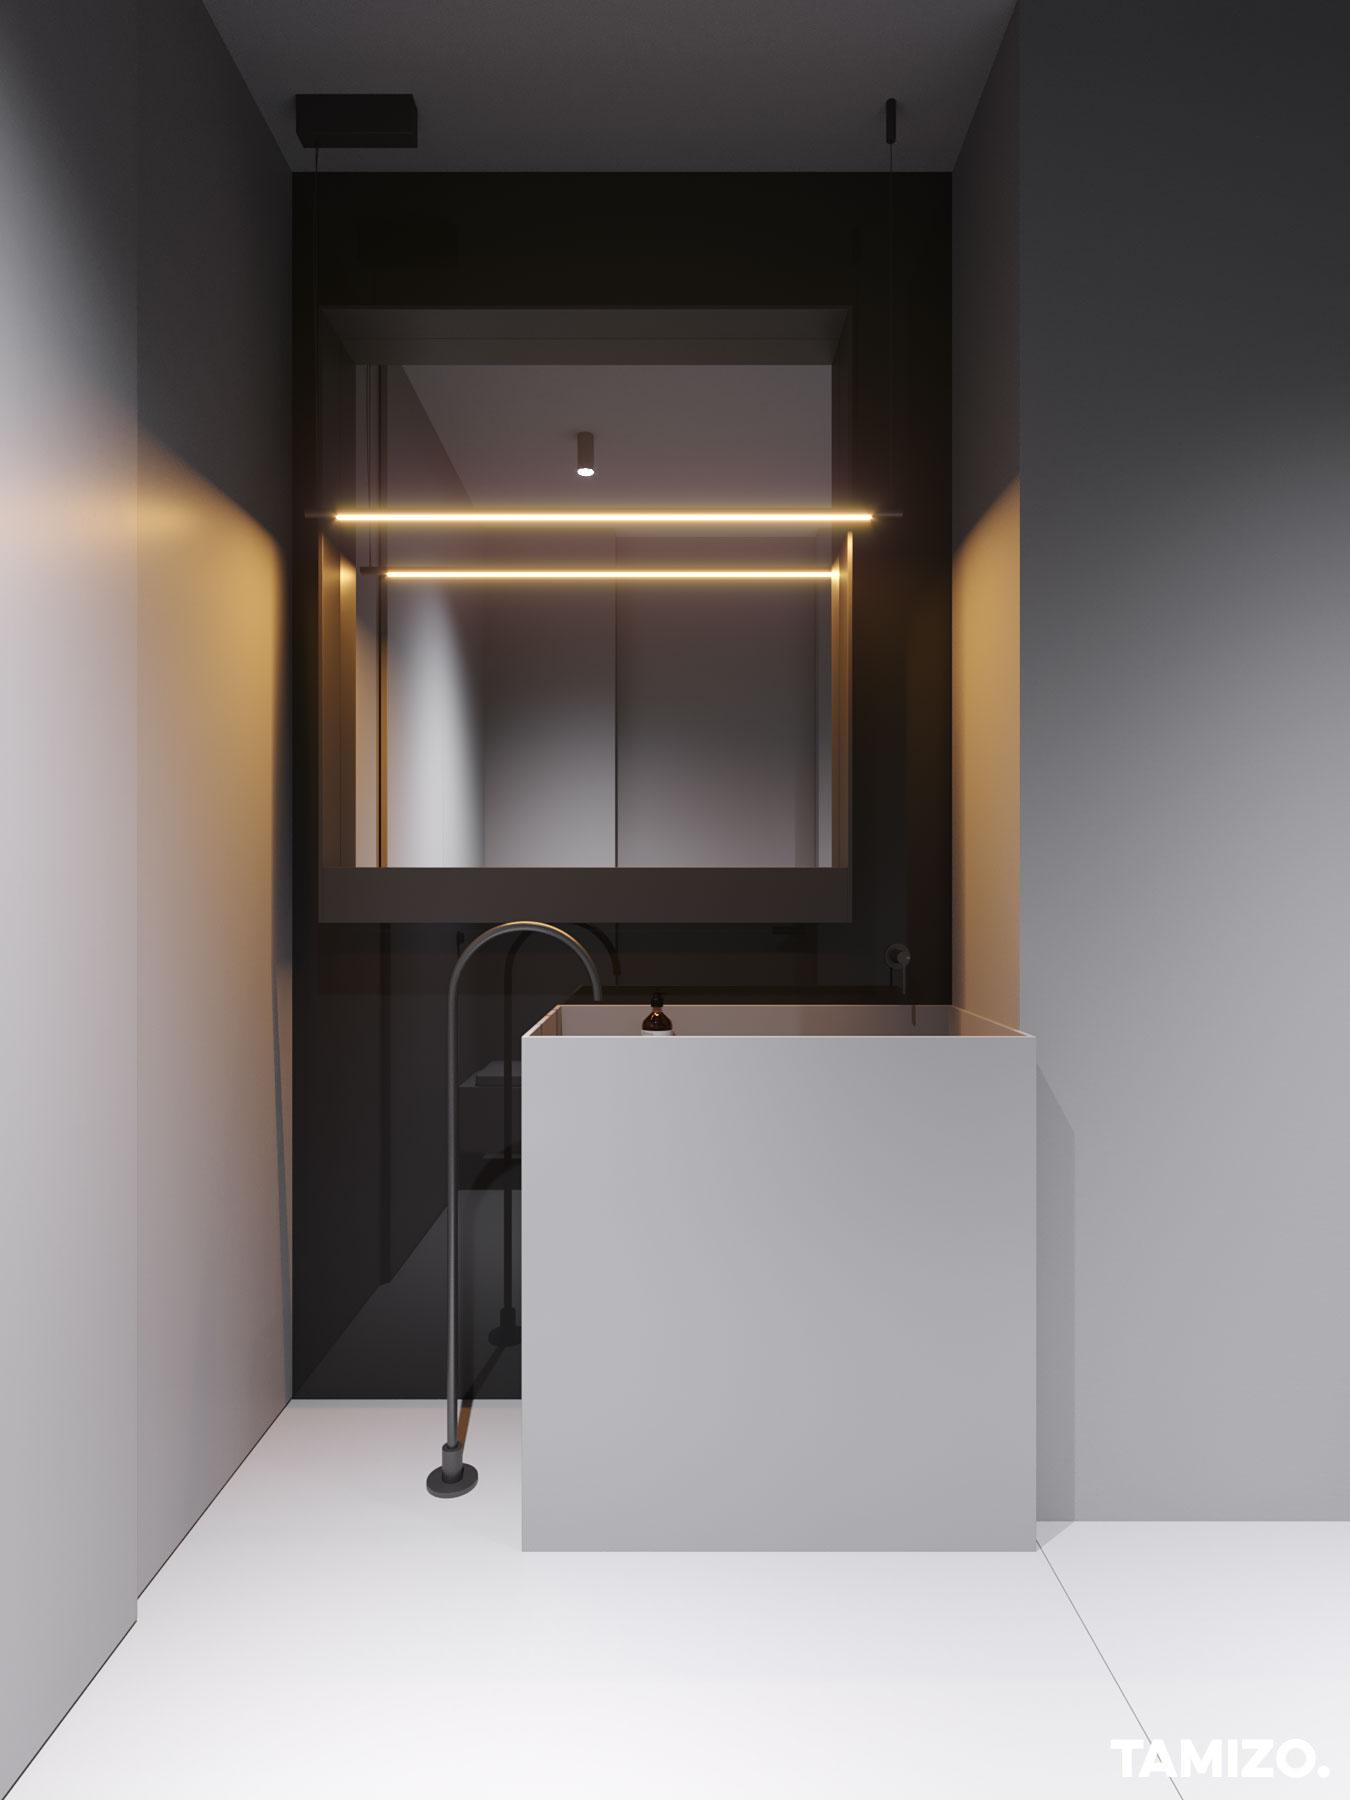 tamizo_interior_wnetrza_projekt_architekci_mateusz_kuo_stolarski_lodz_08